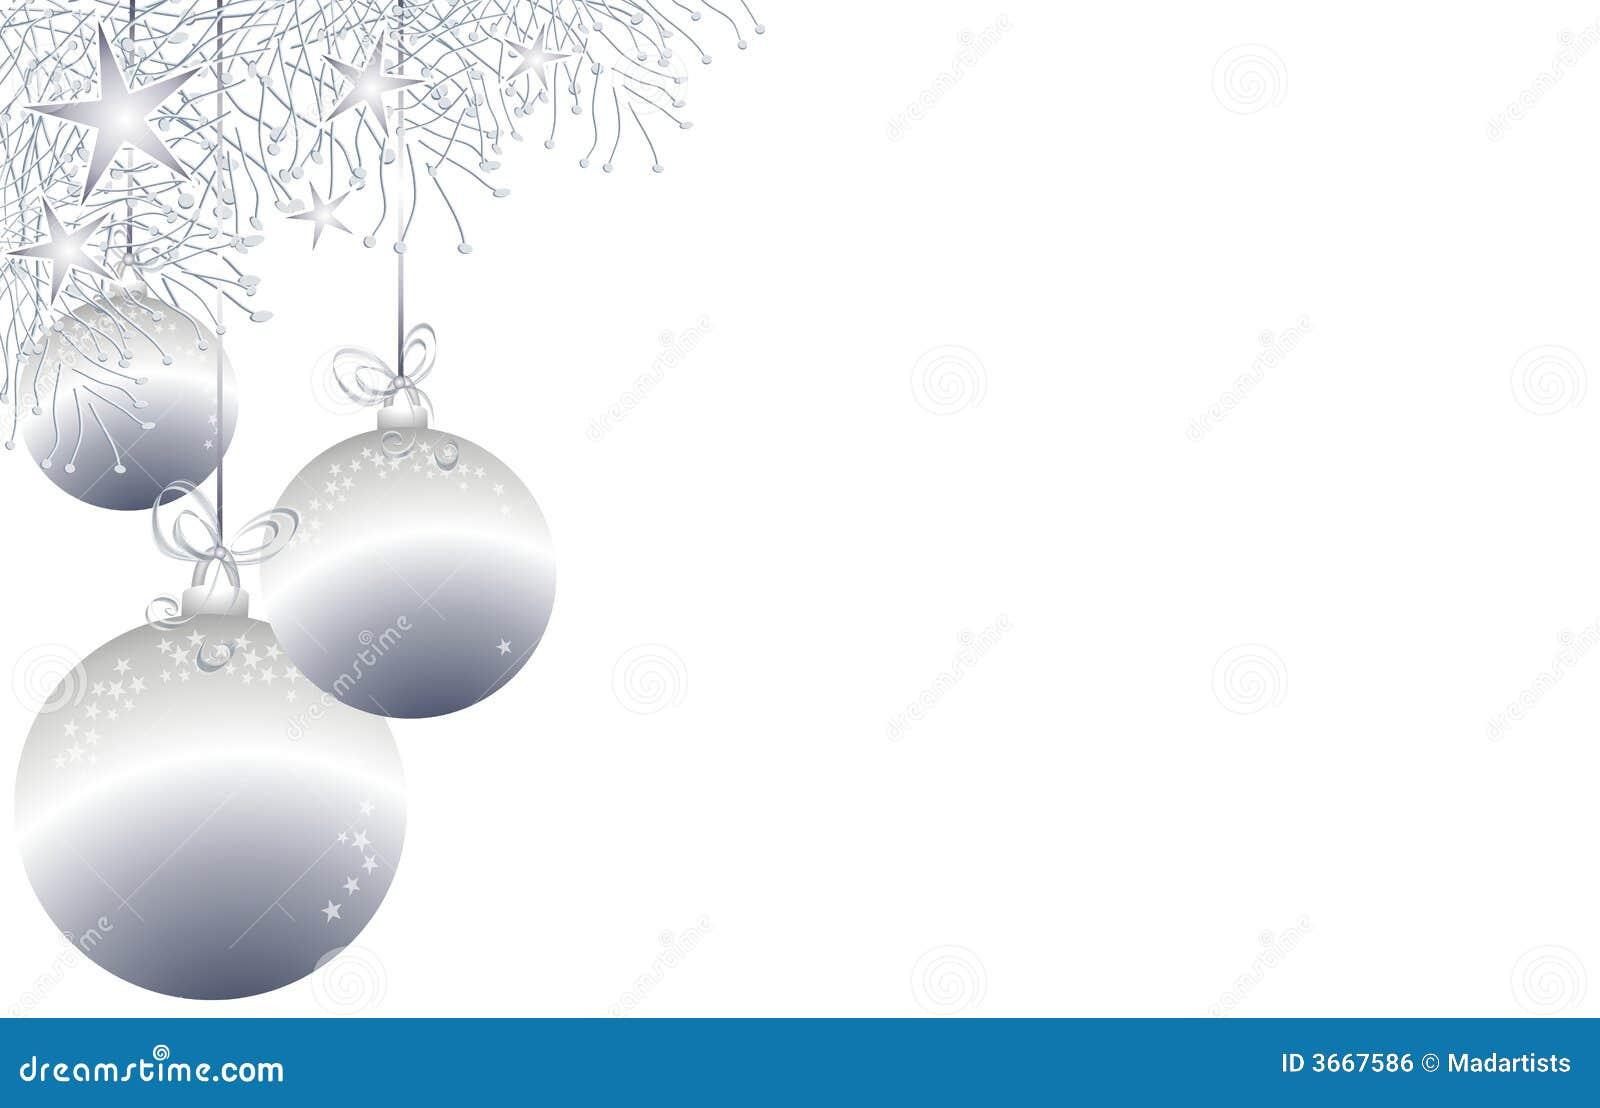 christmas ornaments border 3 stock illustration image. Black Bedroom Furniture Sets. Home Design Ideas